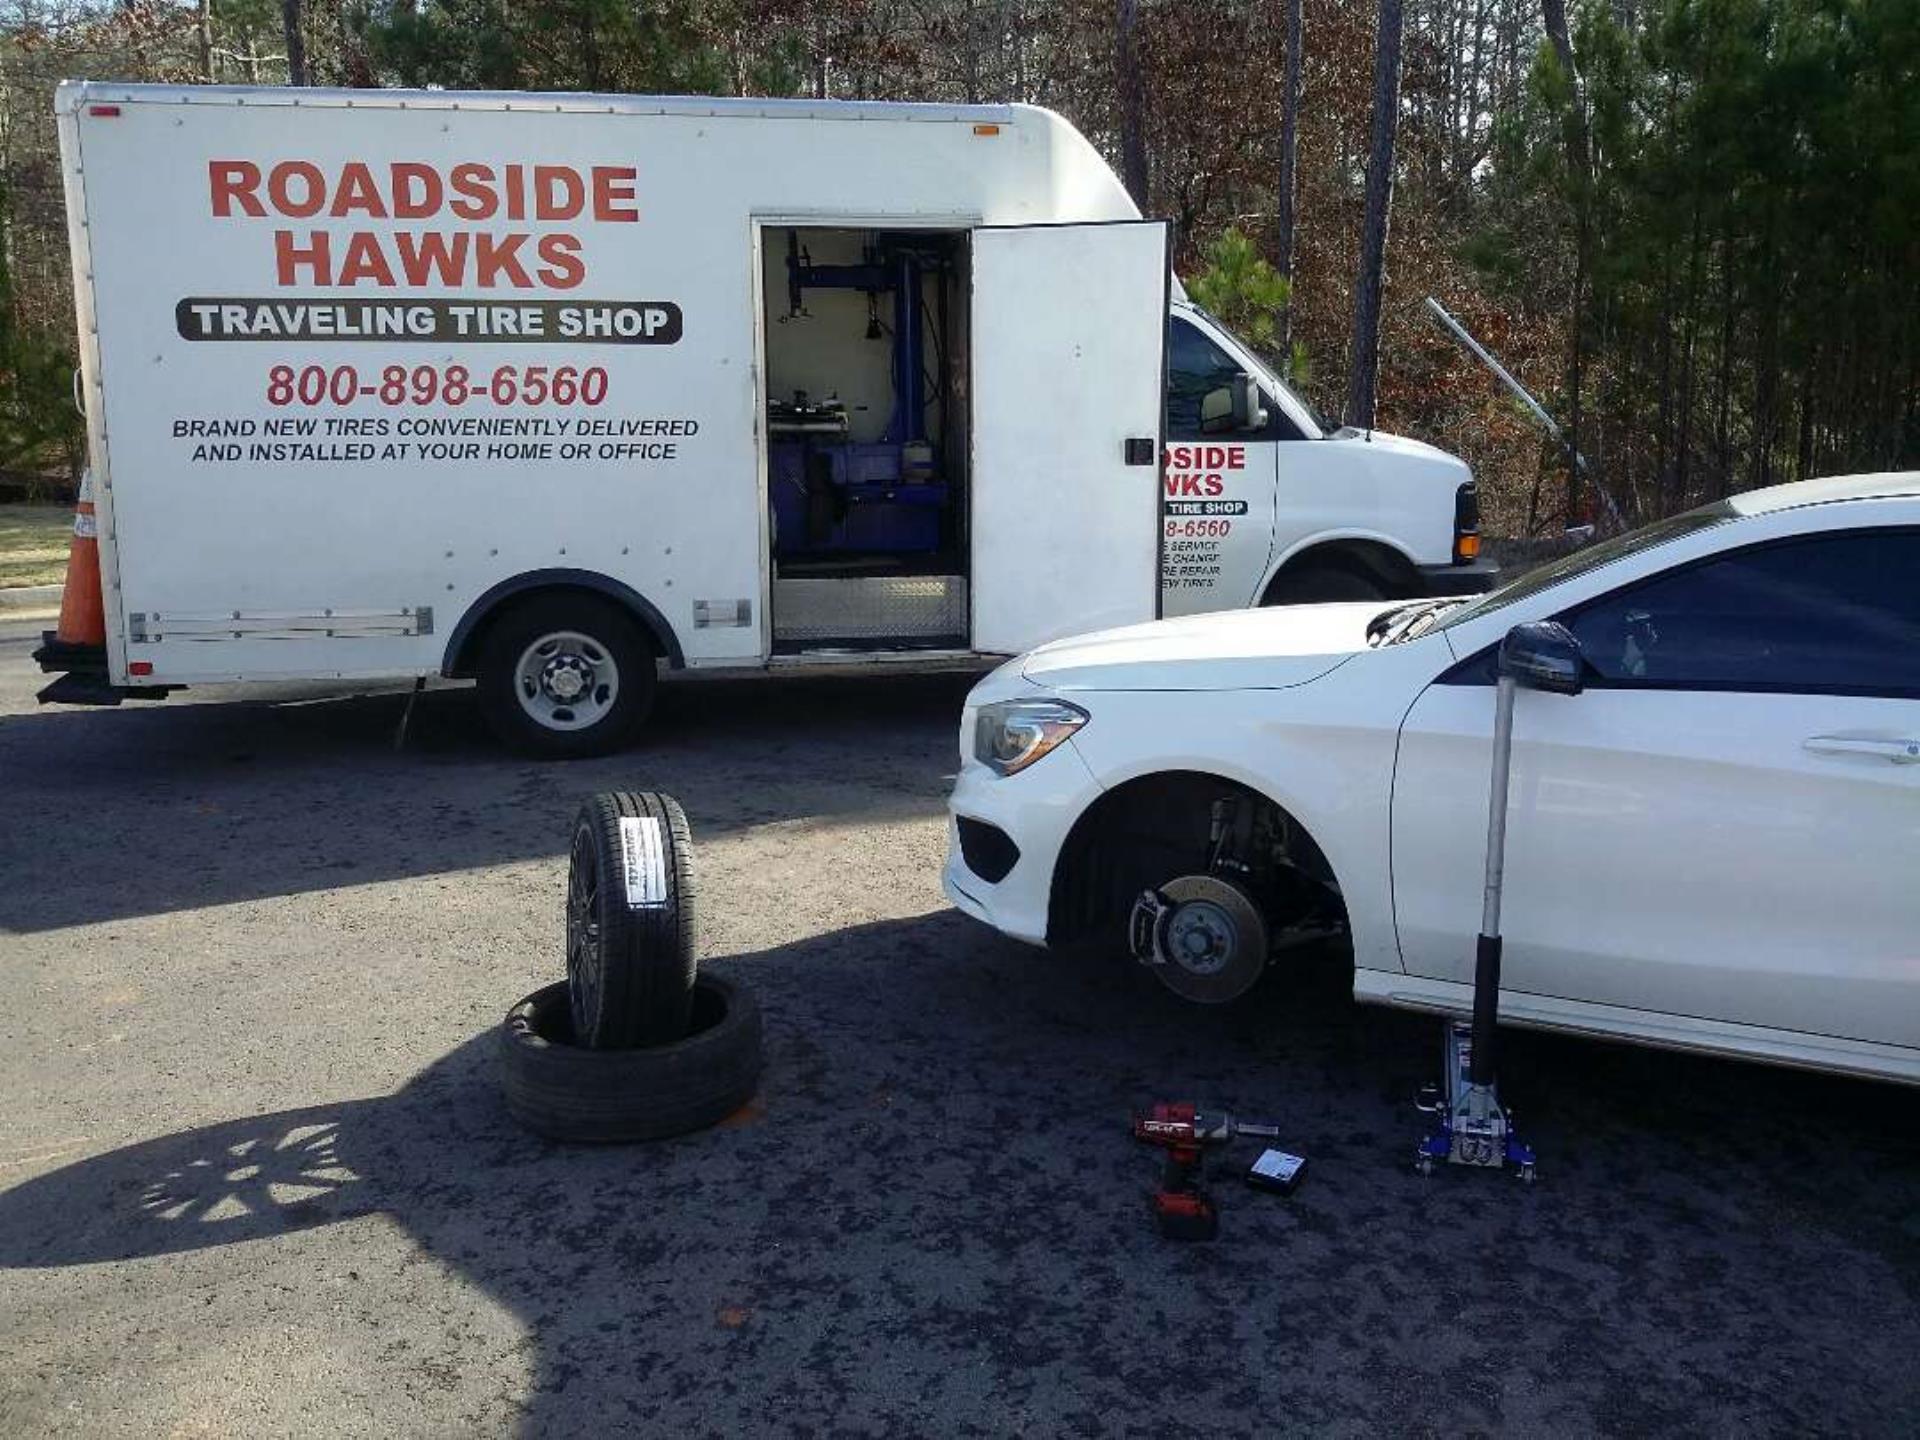 24 HOUR ROADSIDE HAWKS TRAVELING TIRE SHOP ATLANTA GA Business